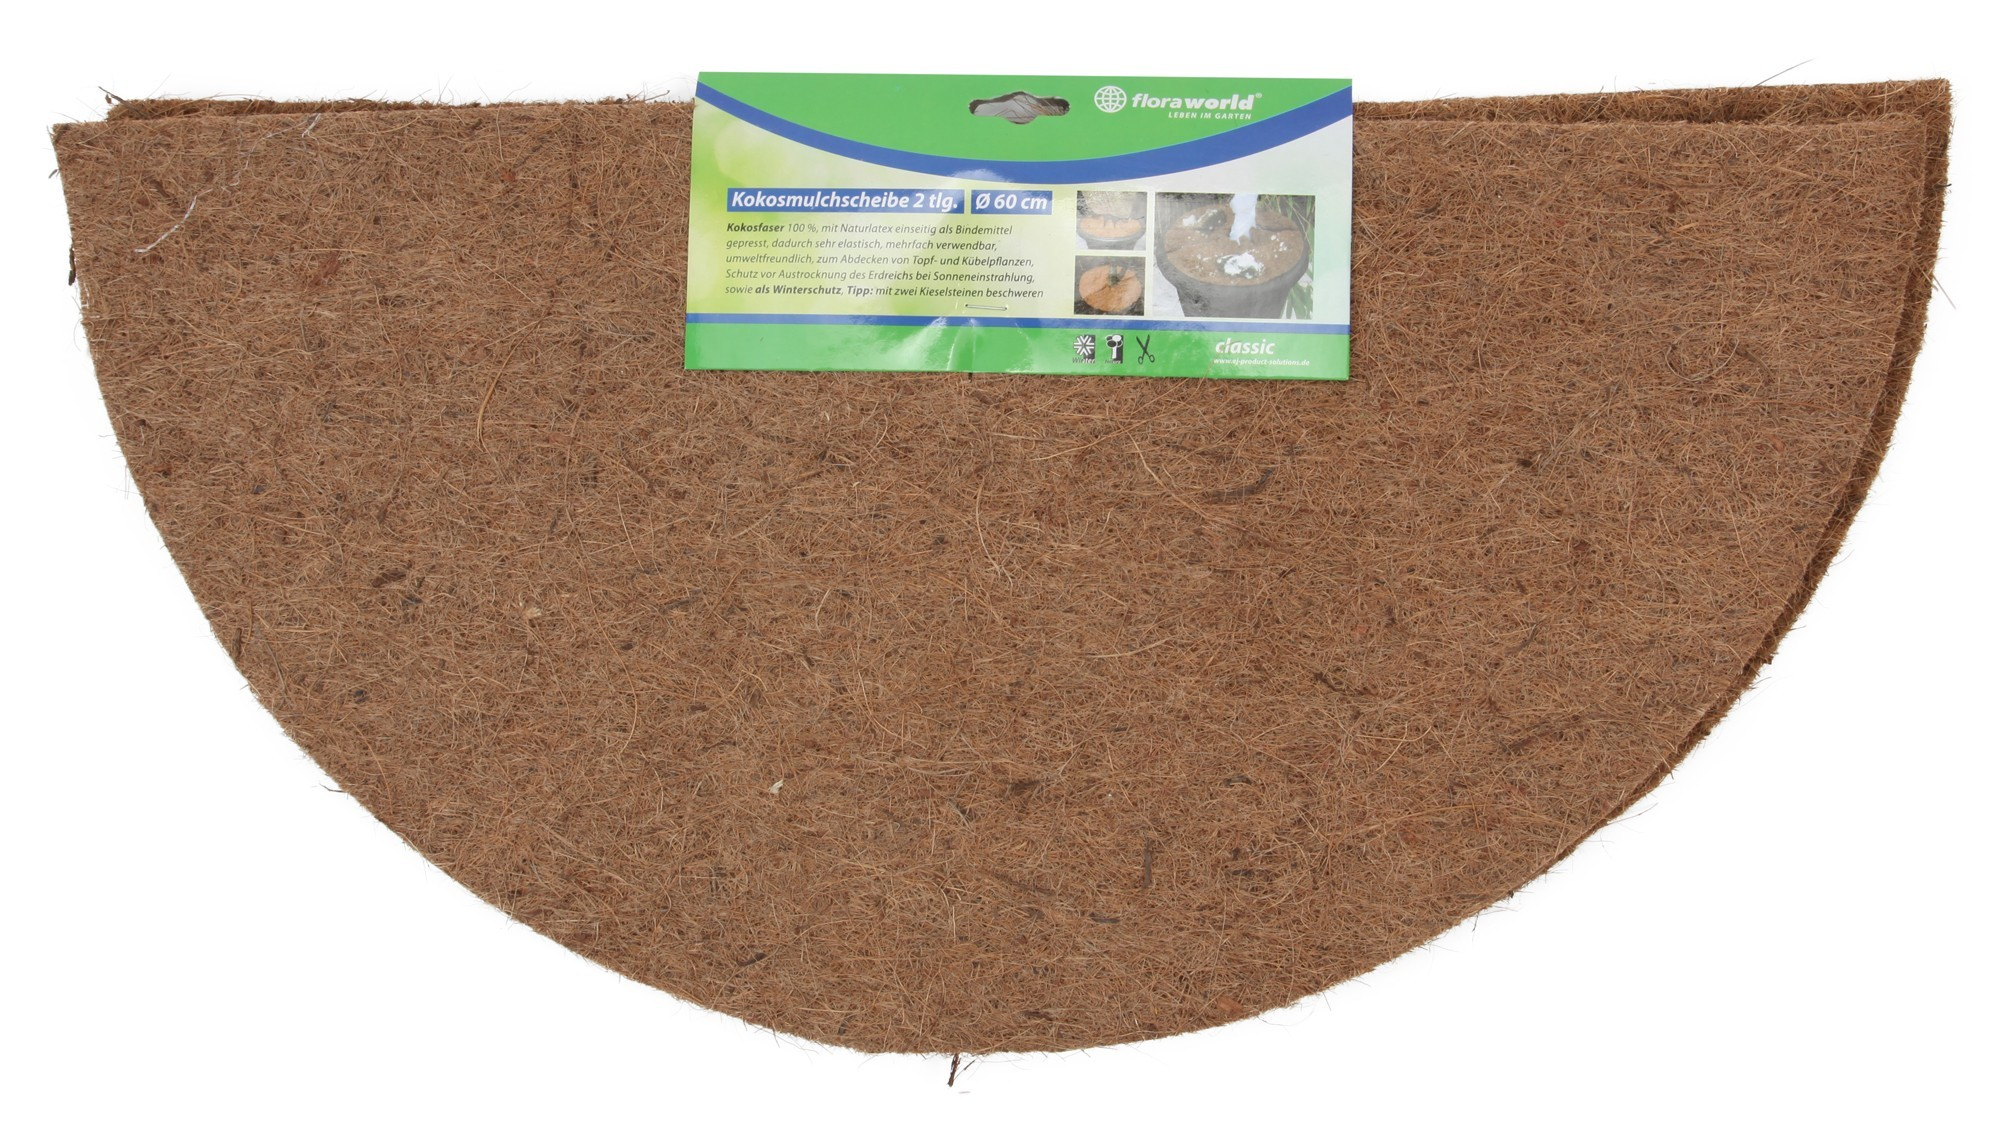 mulchscheibe cocodisc kokos natur 60cm bei. Black Bedroom Furniture Sets. Home Design Ideas